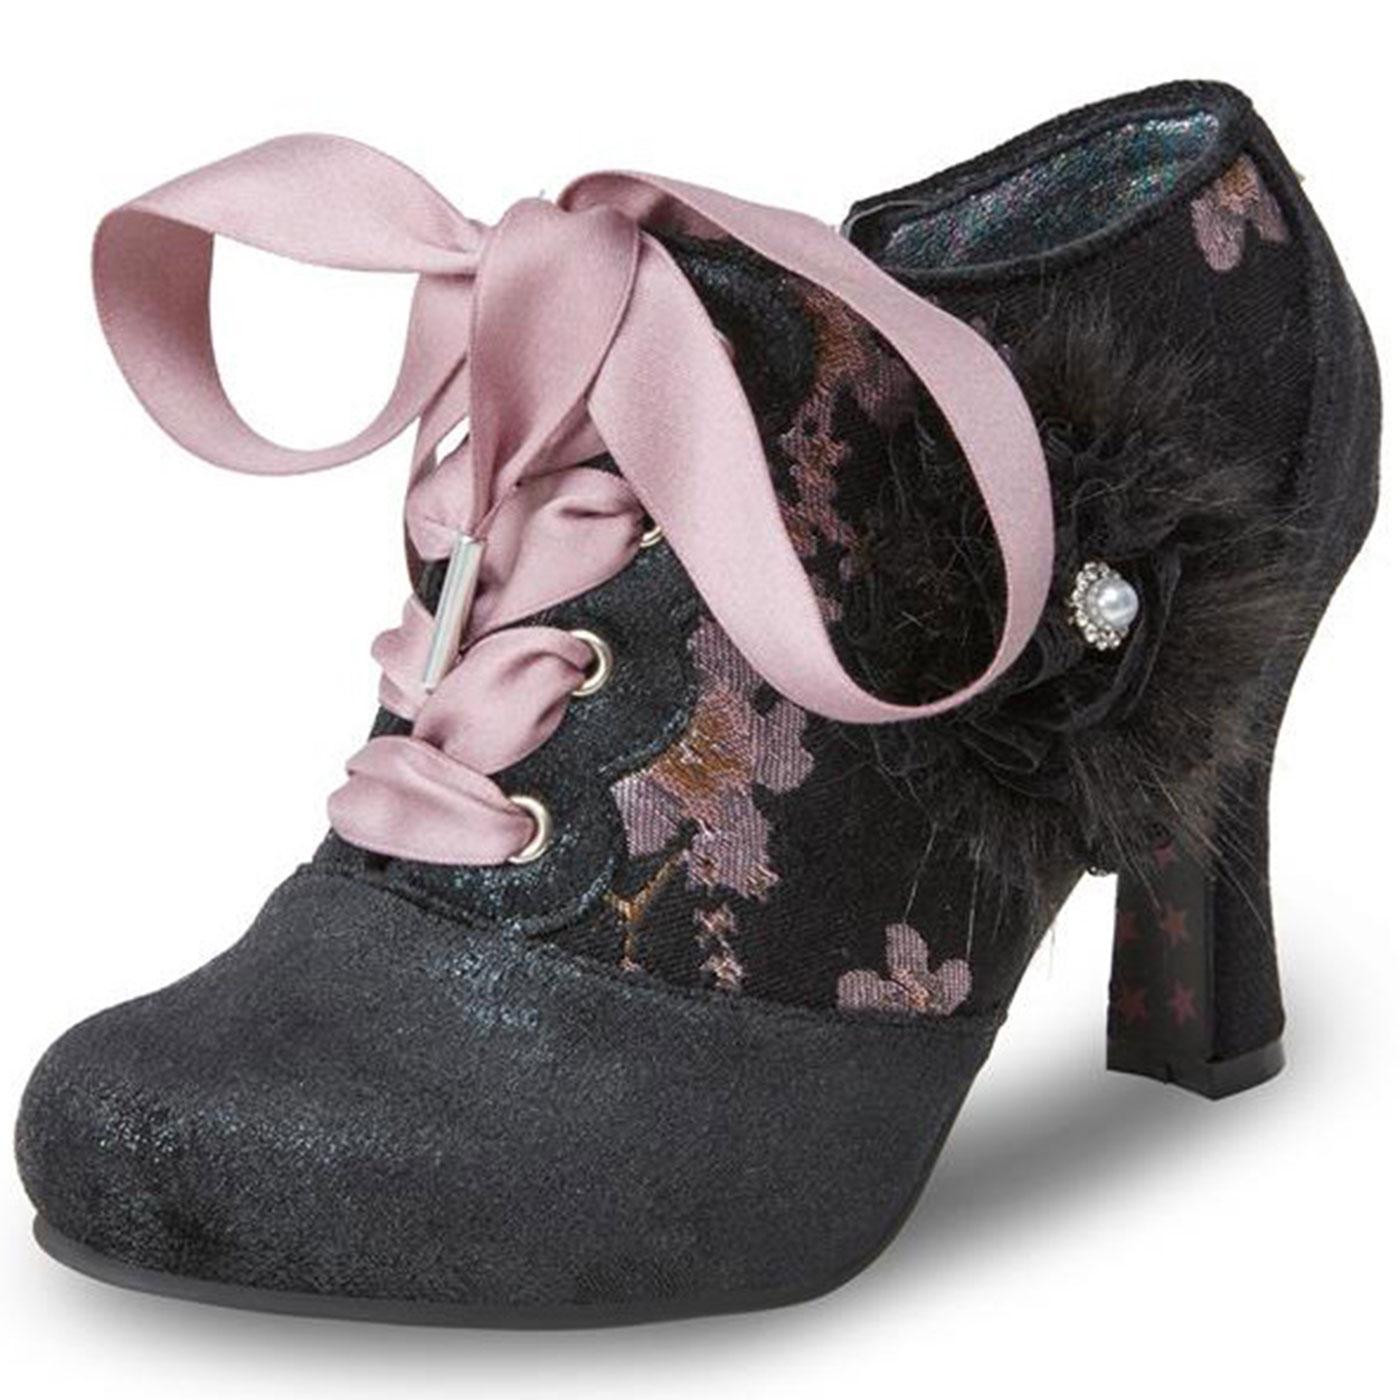 Hermoine JOE BROWNS Vintage Floral Shoe-Boots